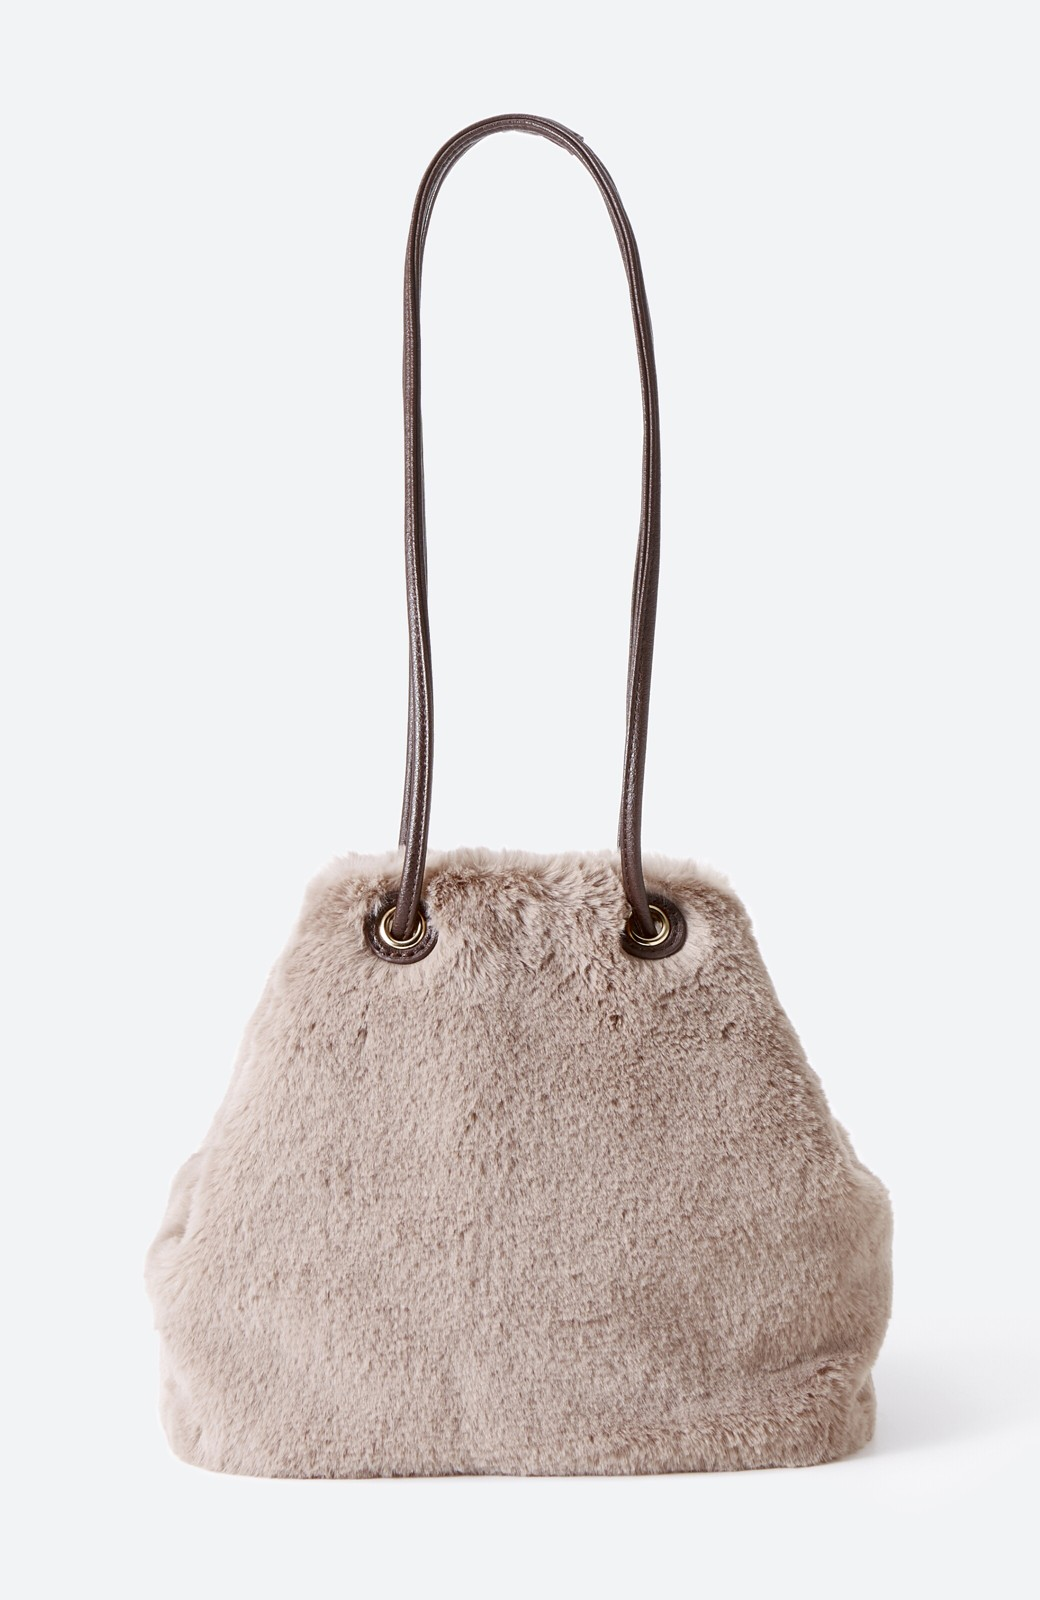 haco! さっと持って気分が上がる ふわっとかわいいエコファー巾着バッグ <グレイッシュベージュ>の商品写真2